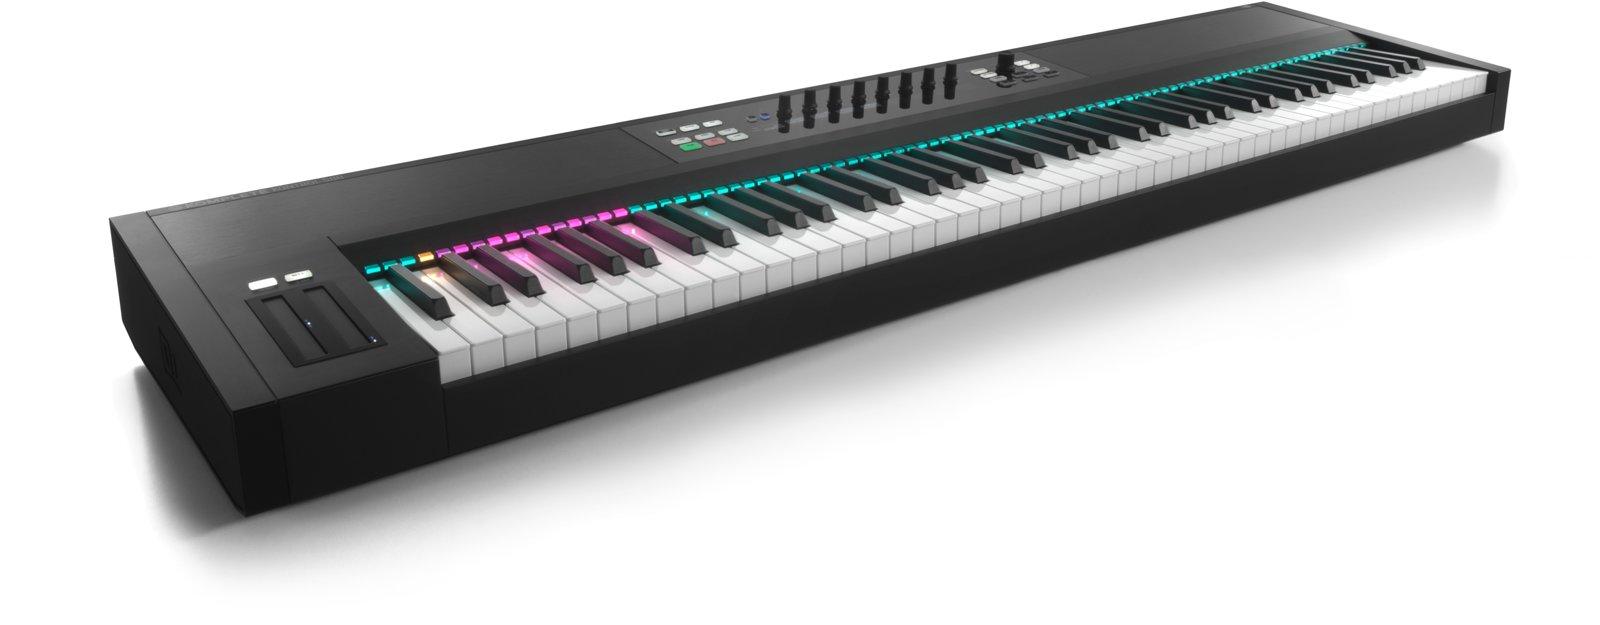 native instruments new 88 key komplete kontrol s series keyboard nks plugin format. Black Bedroom Furniture Sets. Home Design Ideas